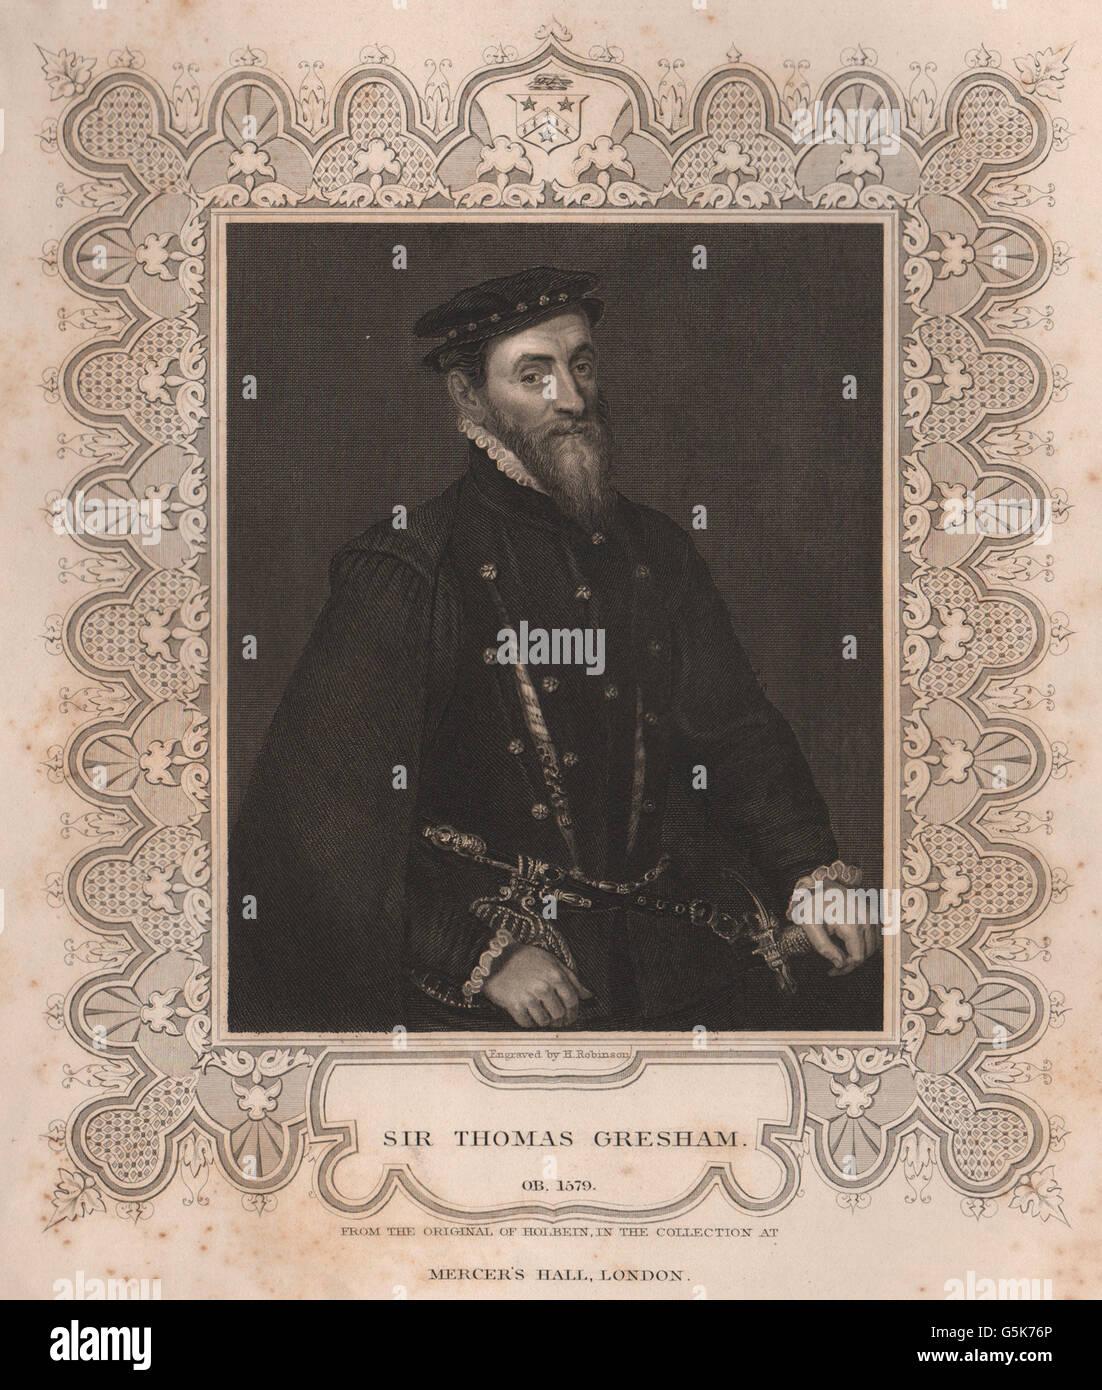 BRITISH HISTORY: Sir Thomas Gresham. TALLIS, antique print 1853 - Stock Image